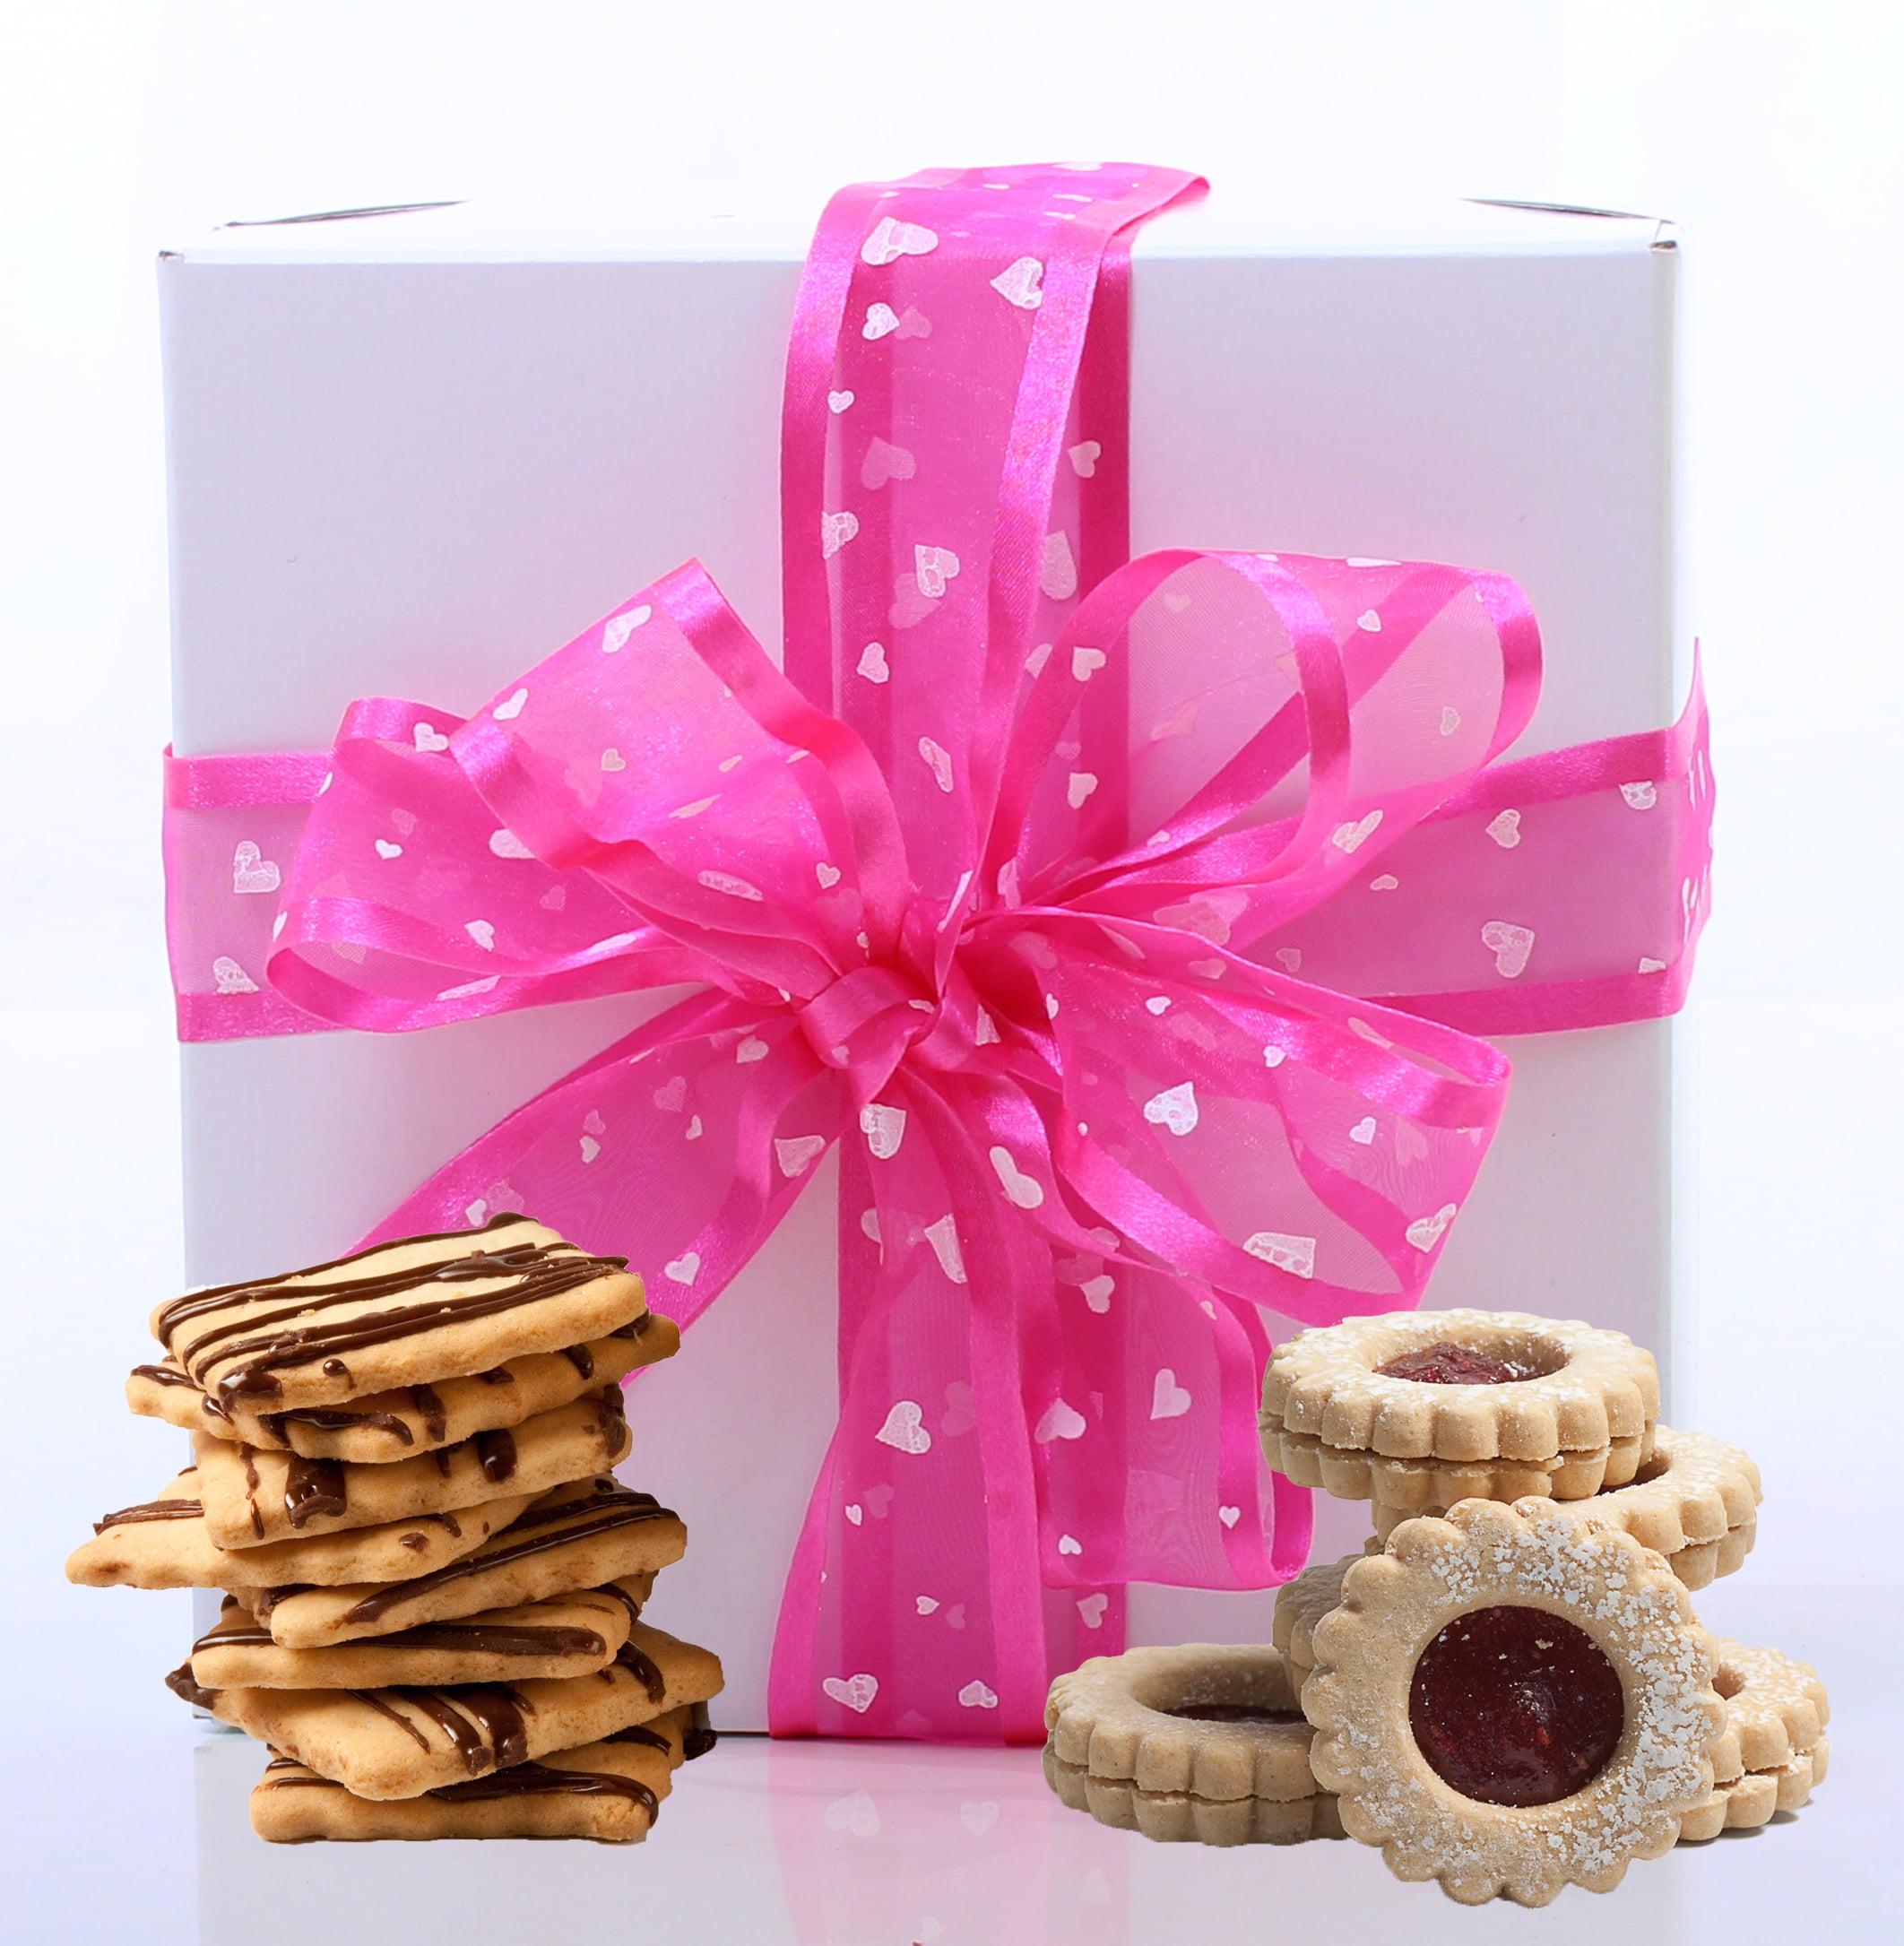 Gluten Free Palace Lady of Honor! Gluten Free Large Gift Box, 1 Lb.